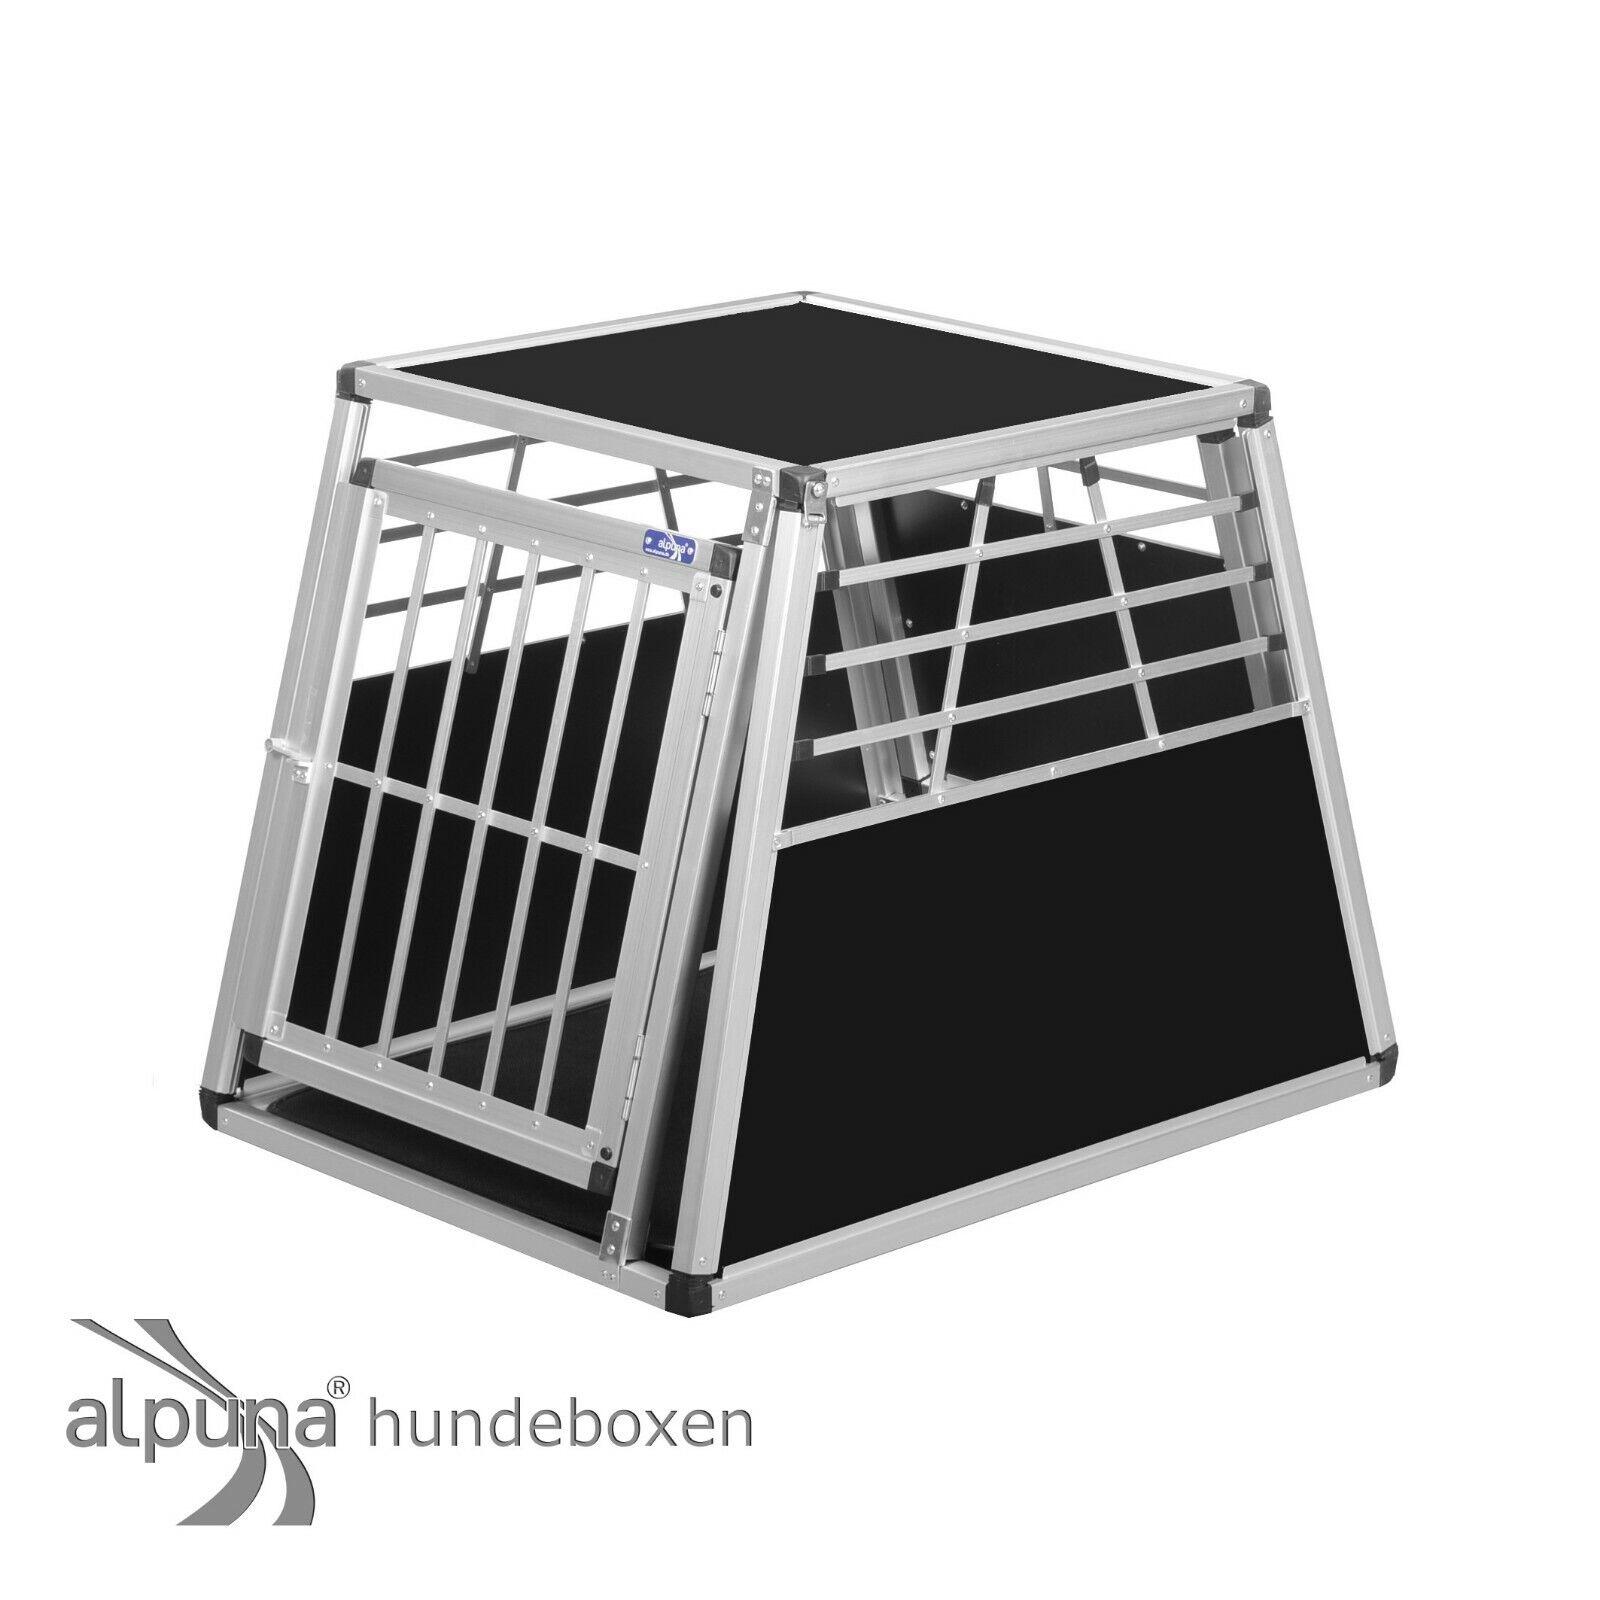 N1 Hundetransportbox Gitterbox Aluminium Transportbox Hundebox Alubox Autobox